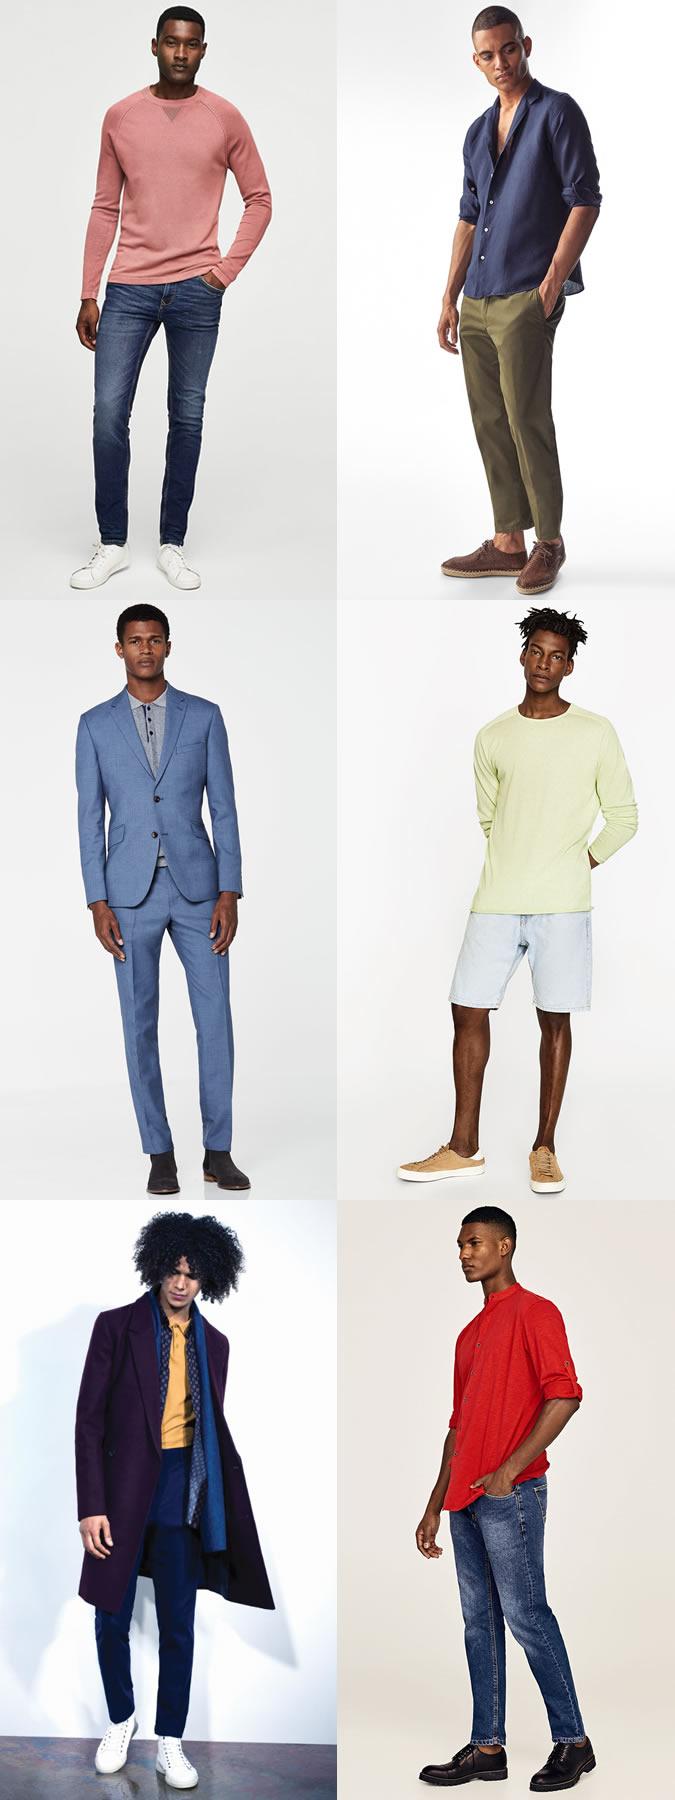 انتخاب لباس مناسب رنگ پوست